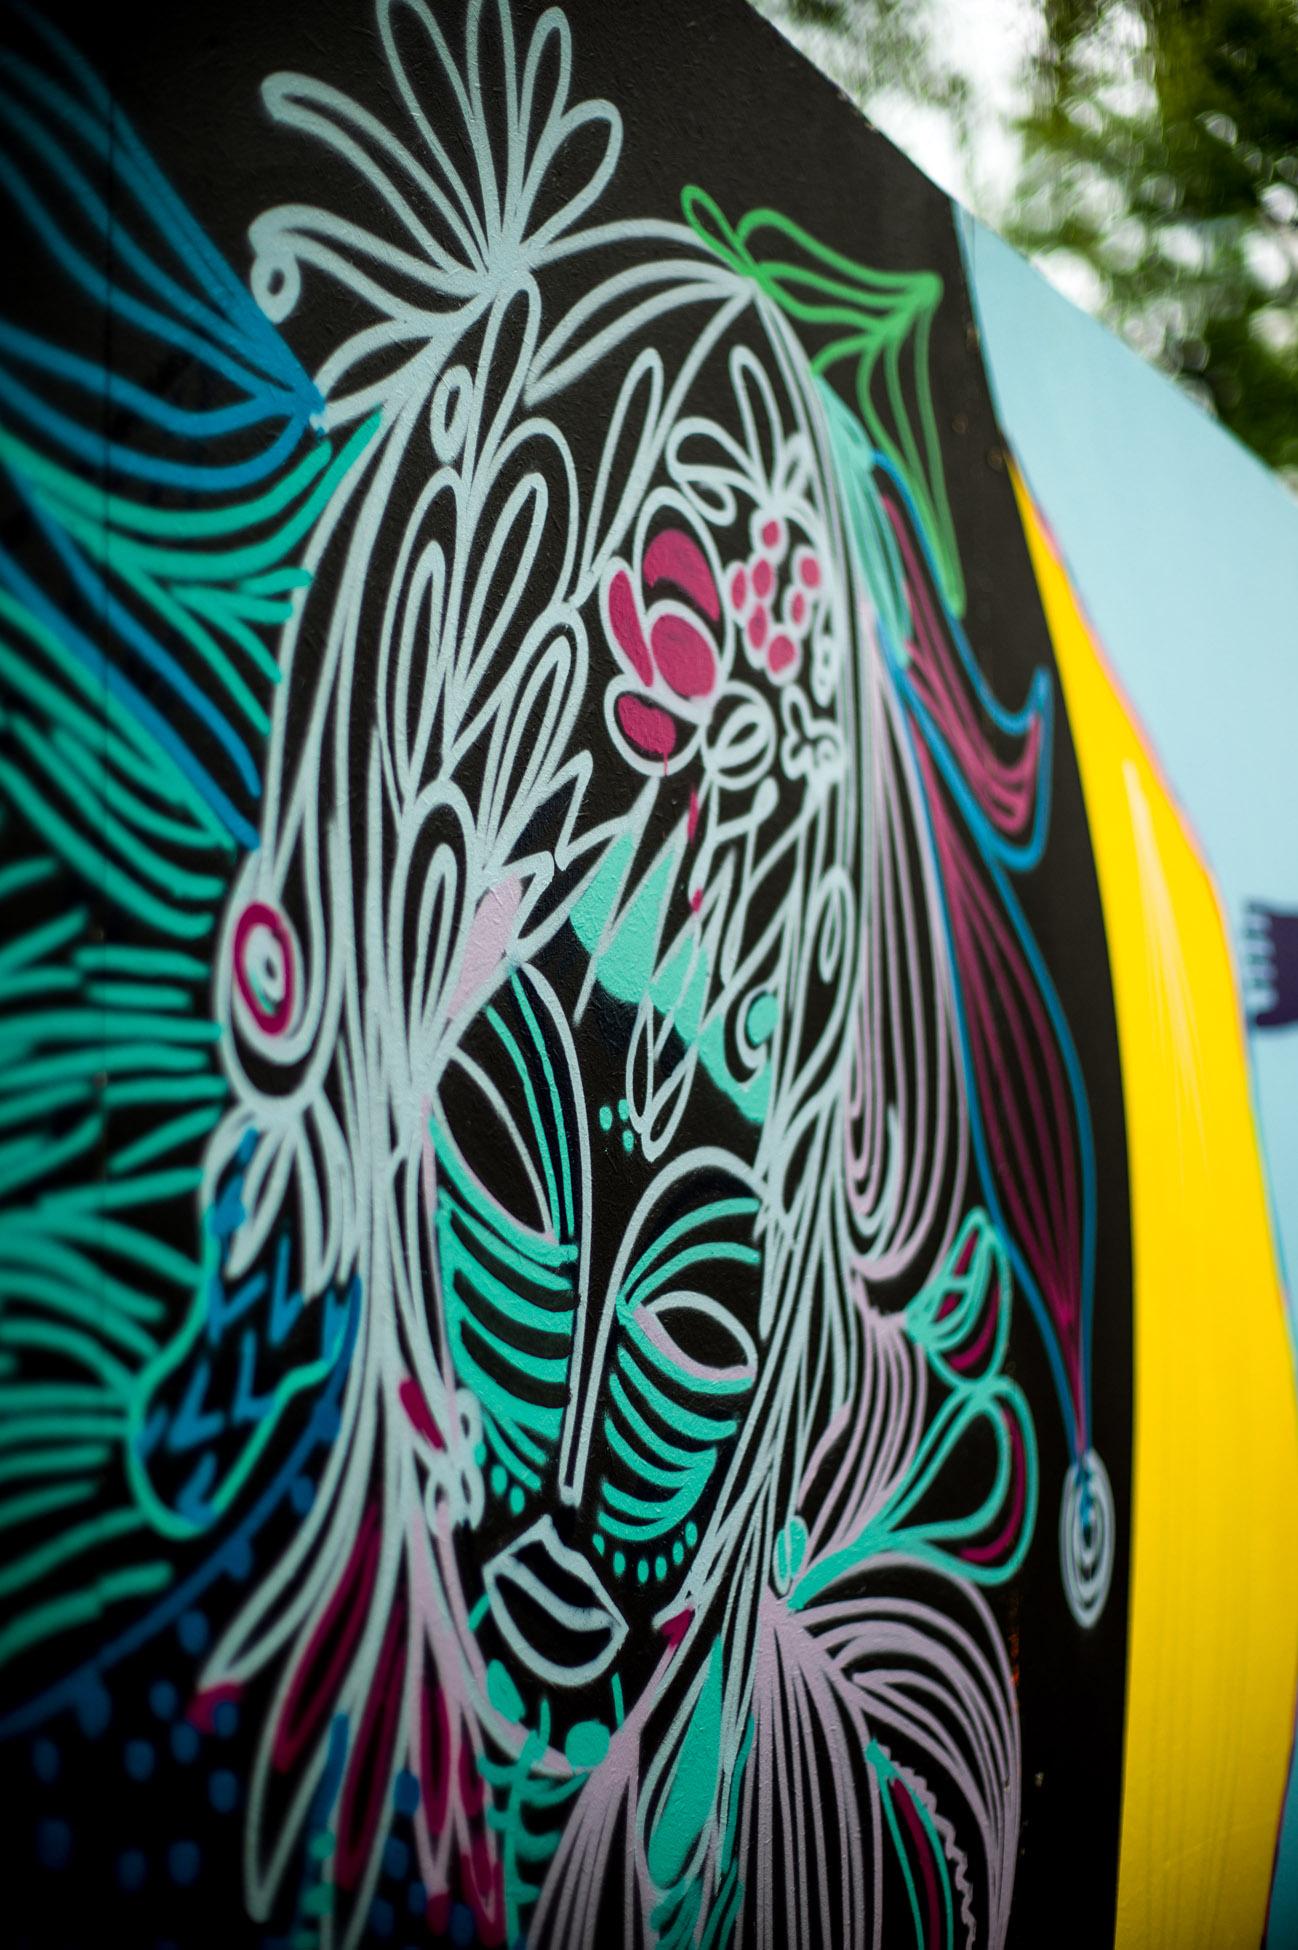 Streetart_Brazil_Rimon guimaraes_2013_Frankfurt (14 von 15)